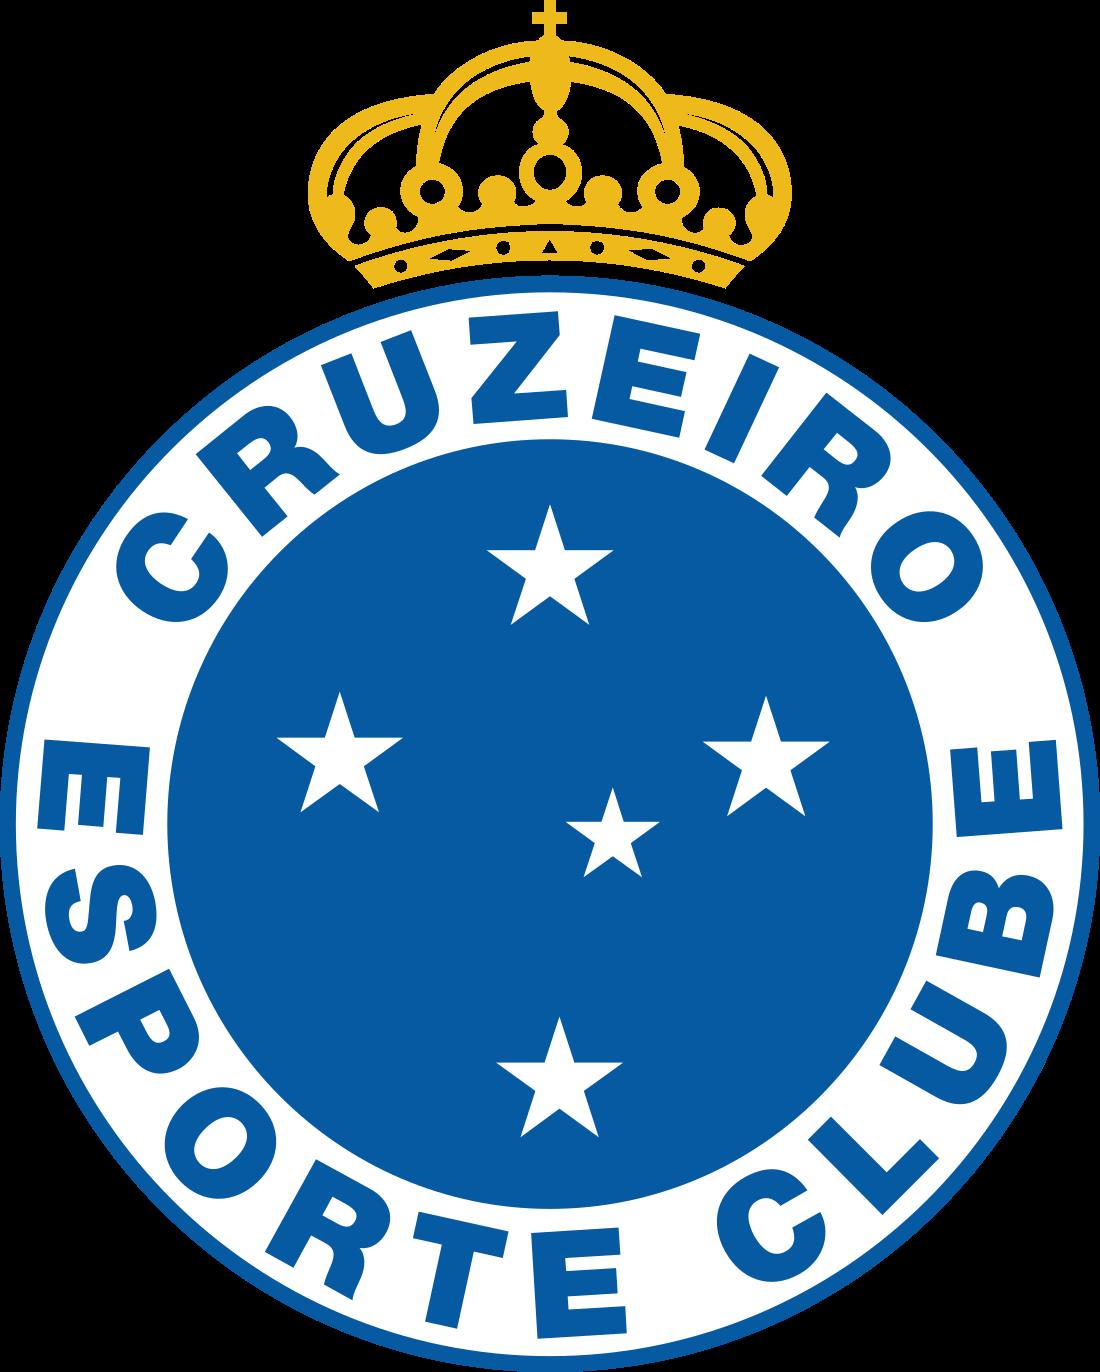 cruzeiro logo escudo 10  - Cruzeiro Logo - Escudo